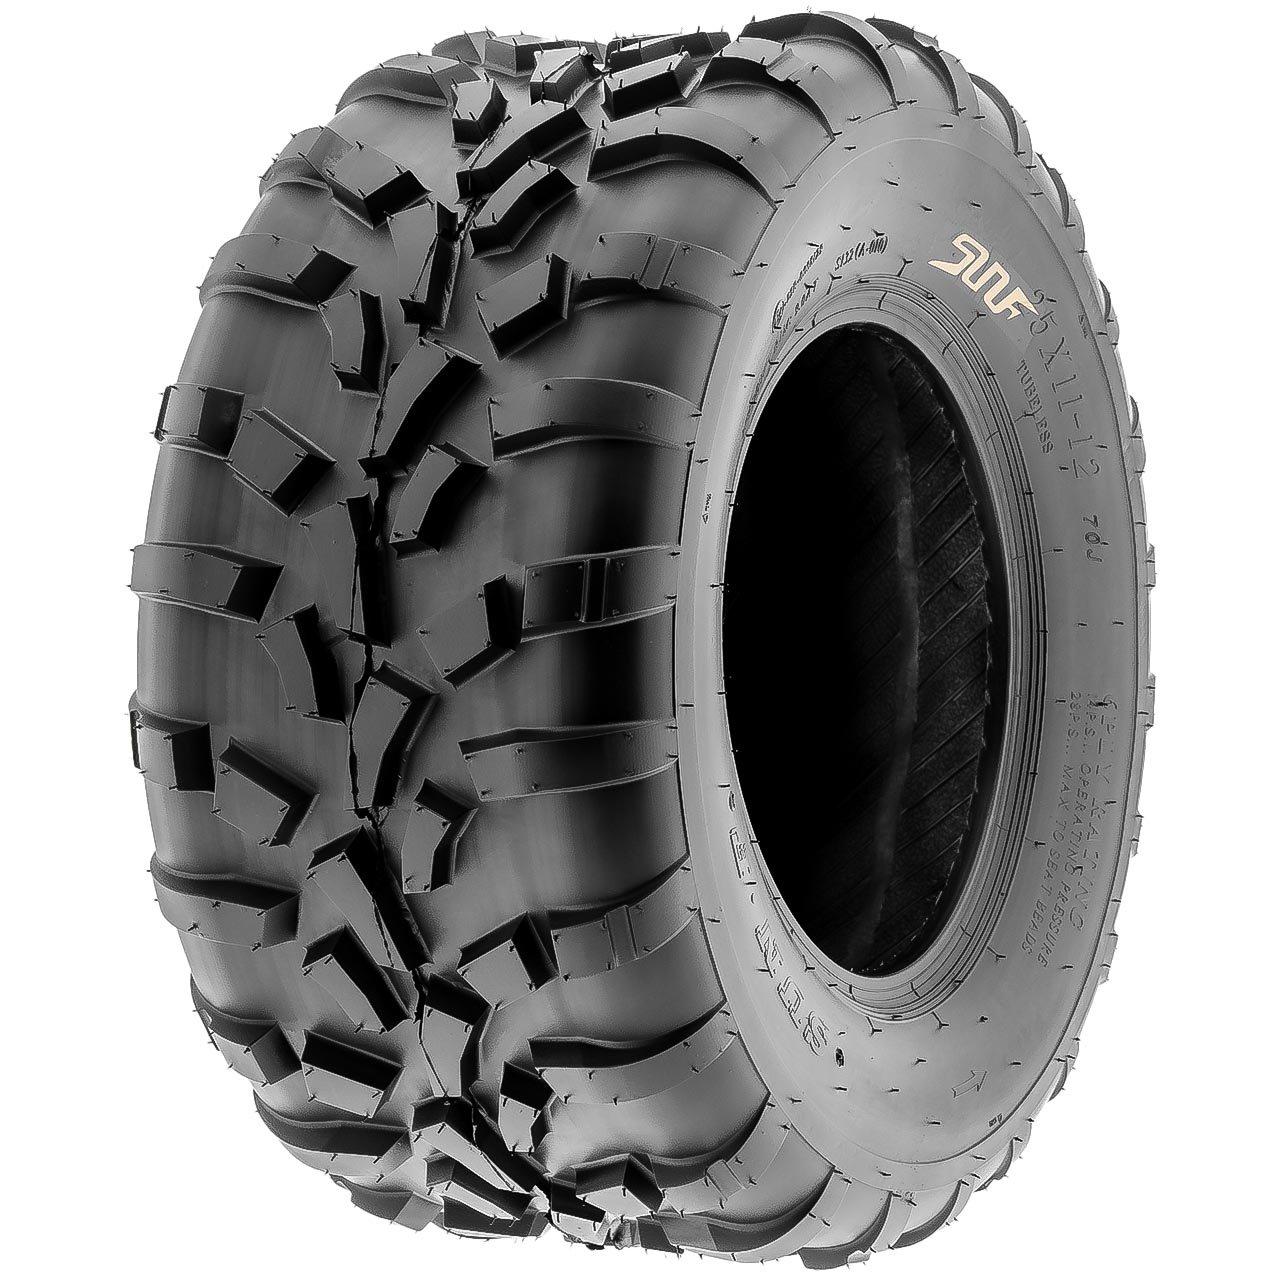 SunF 25x11-10 (25x11x10) ATV/UTV Off-Road Tire, 6PR, Directional Knobby Tread | A010